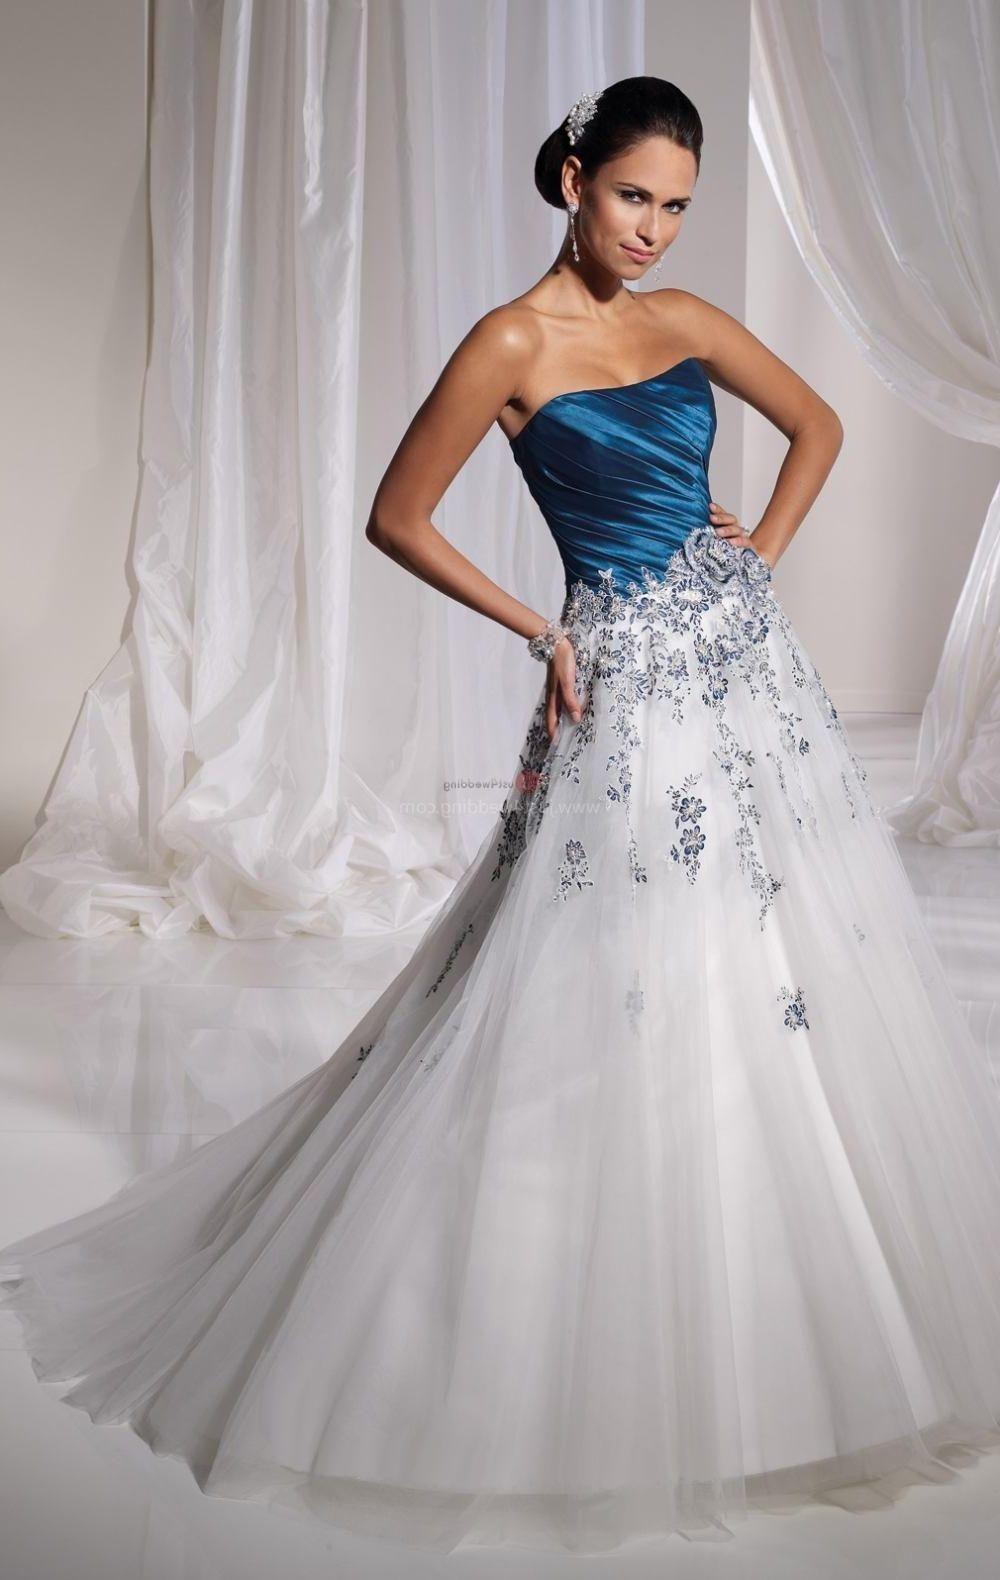 White Wedding Dress Meaning In Dreams Gaun Prom Beautiful [ 1580 x 1000 Pixel ]